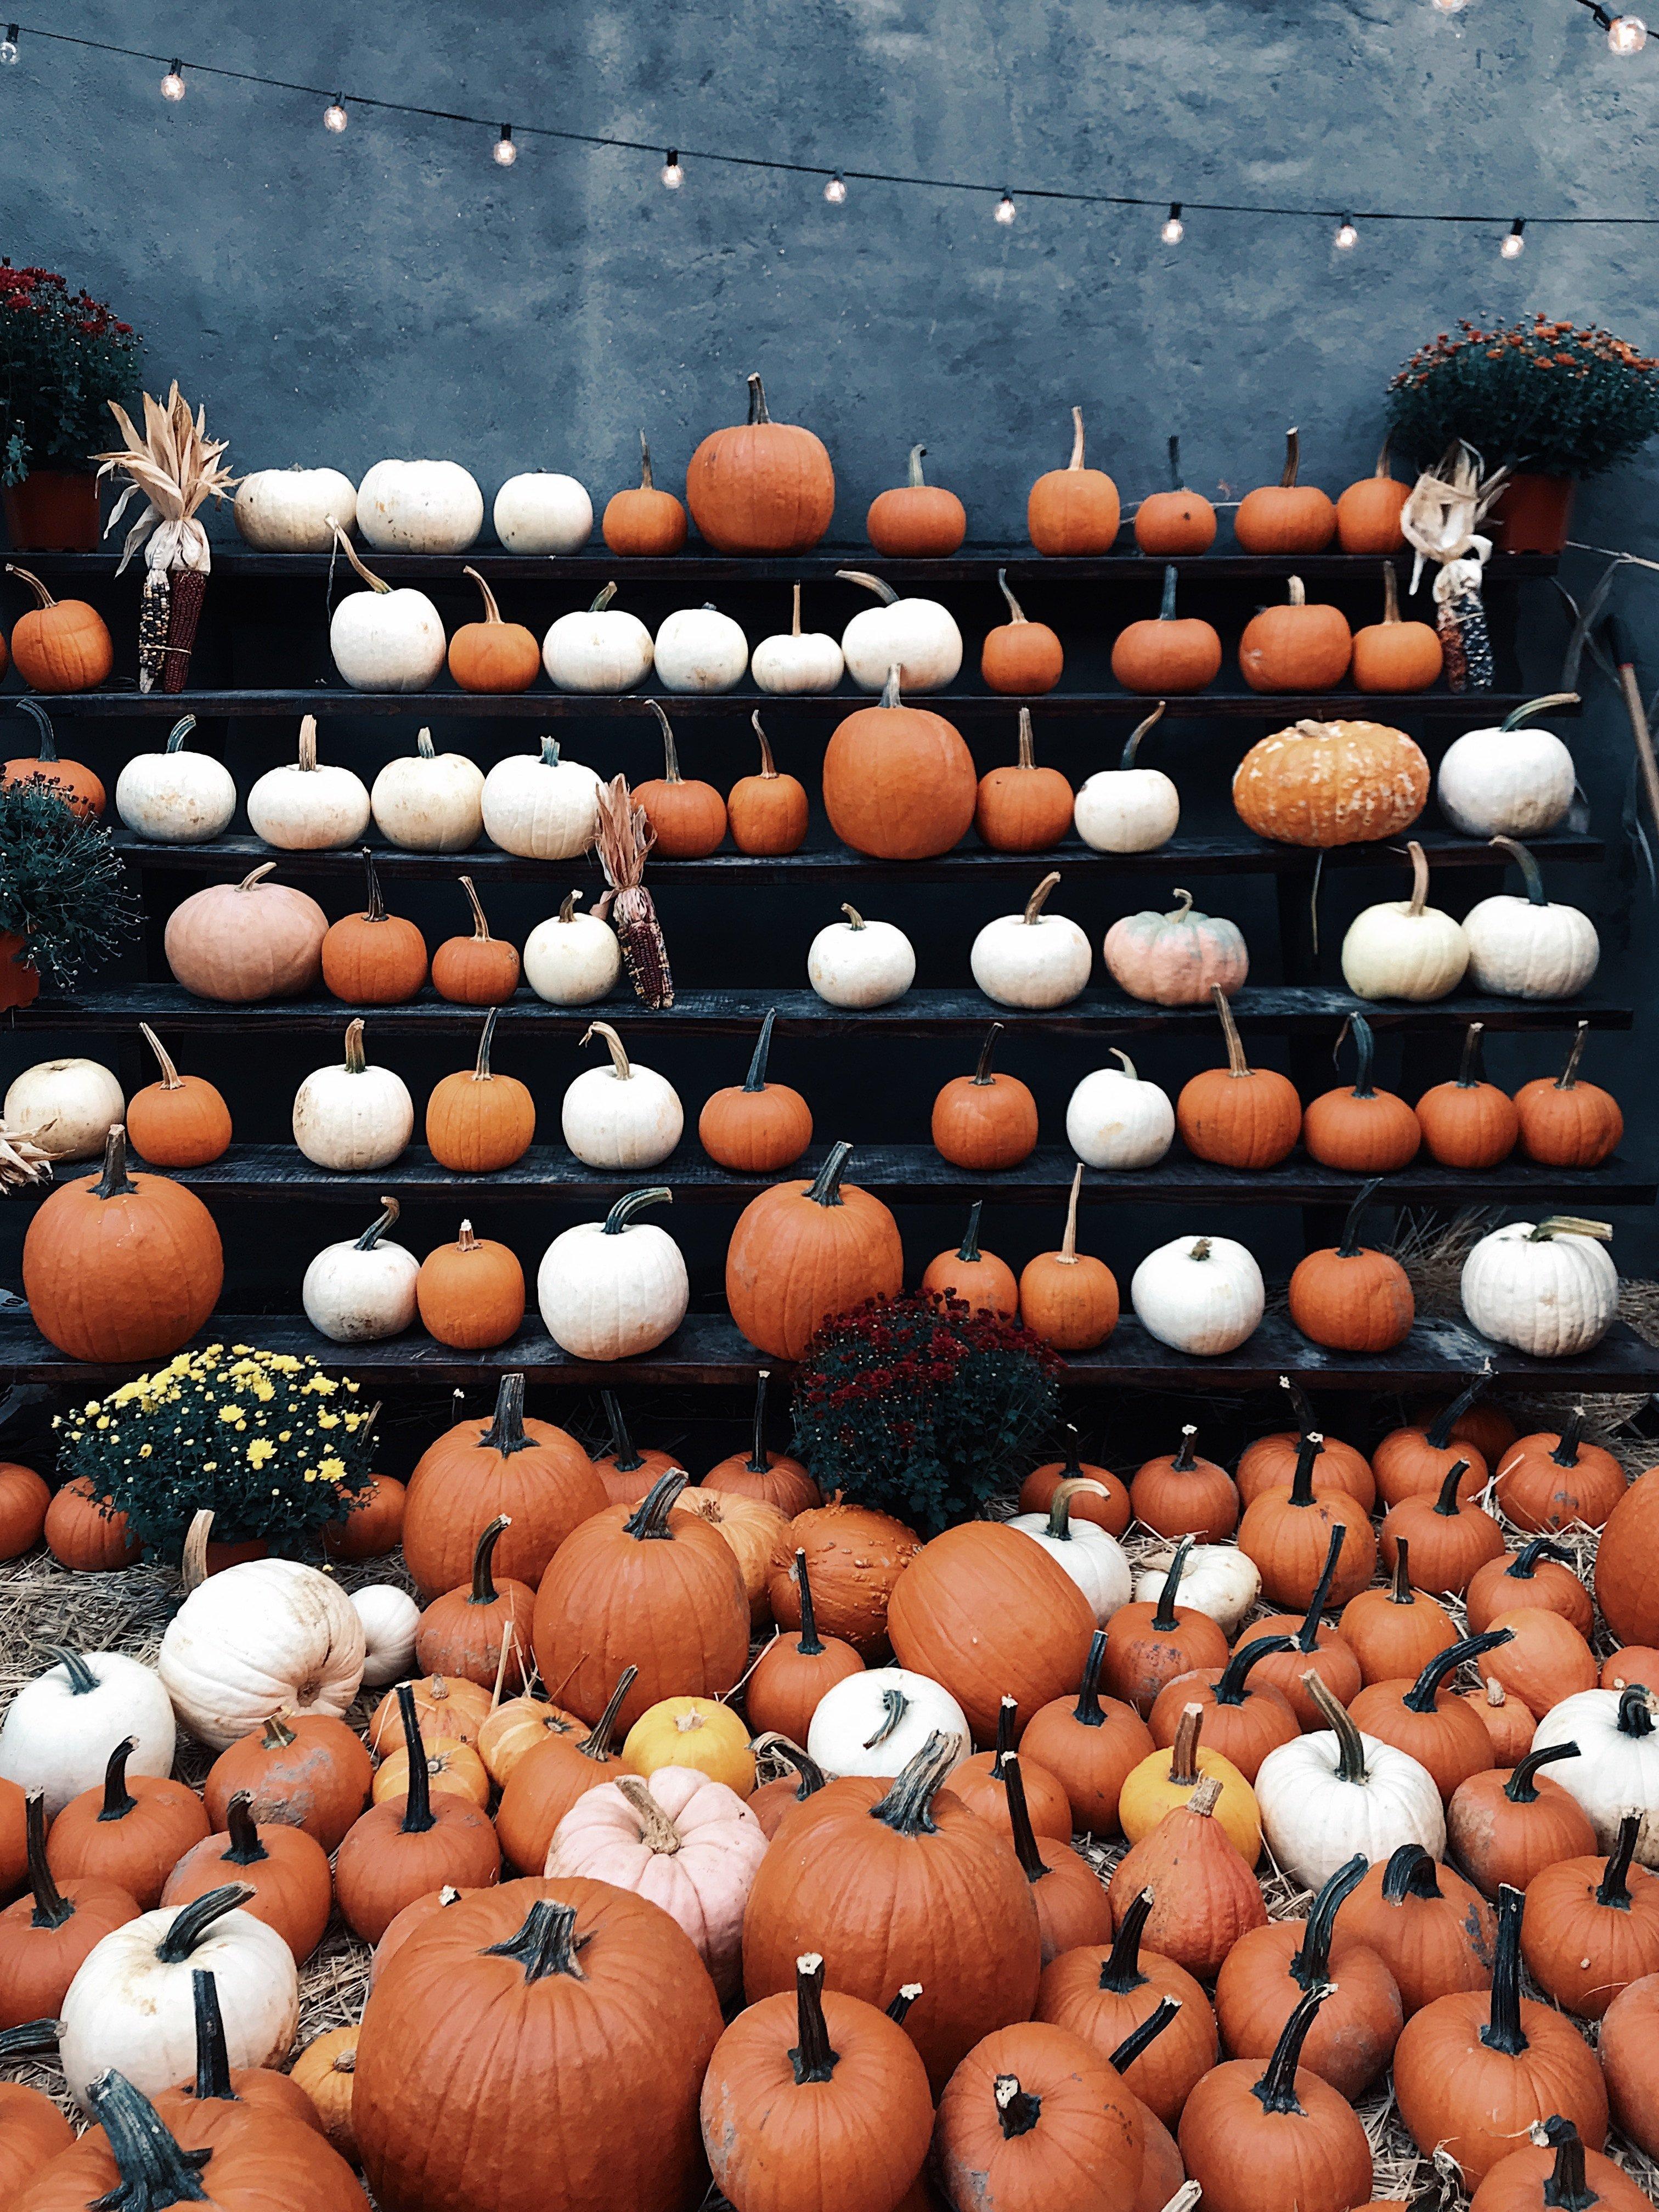 Fall Bucket list & Autumn Photography Challenge October